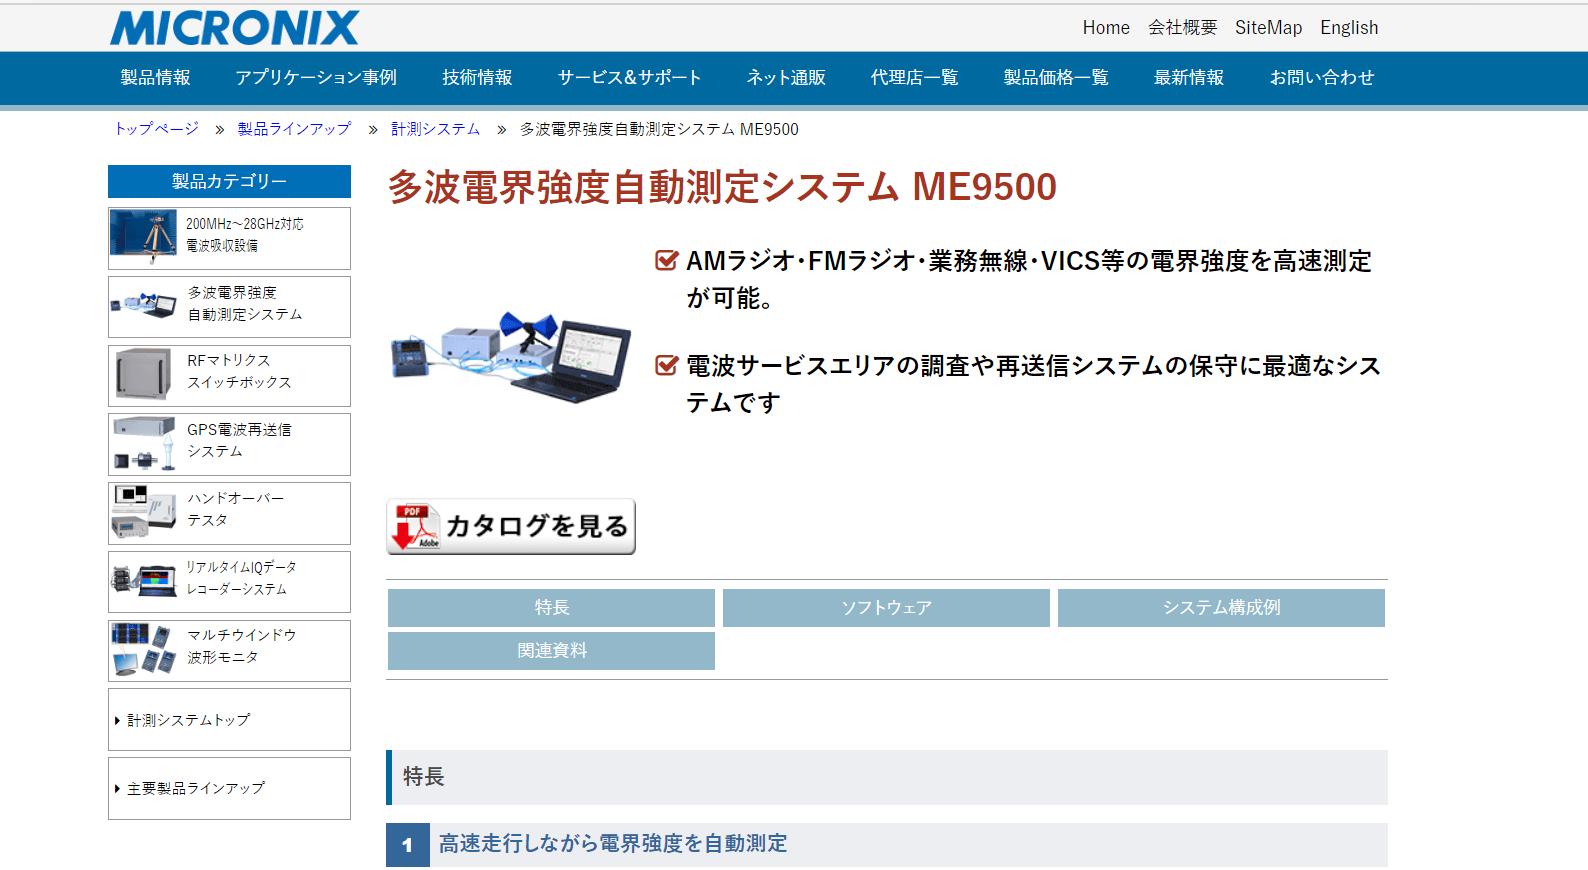 ME9500